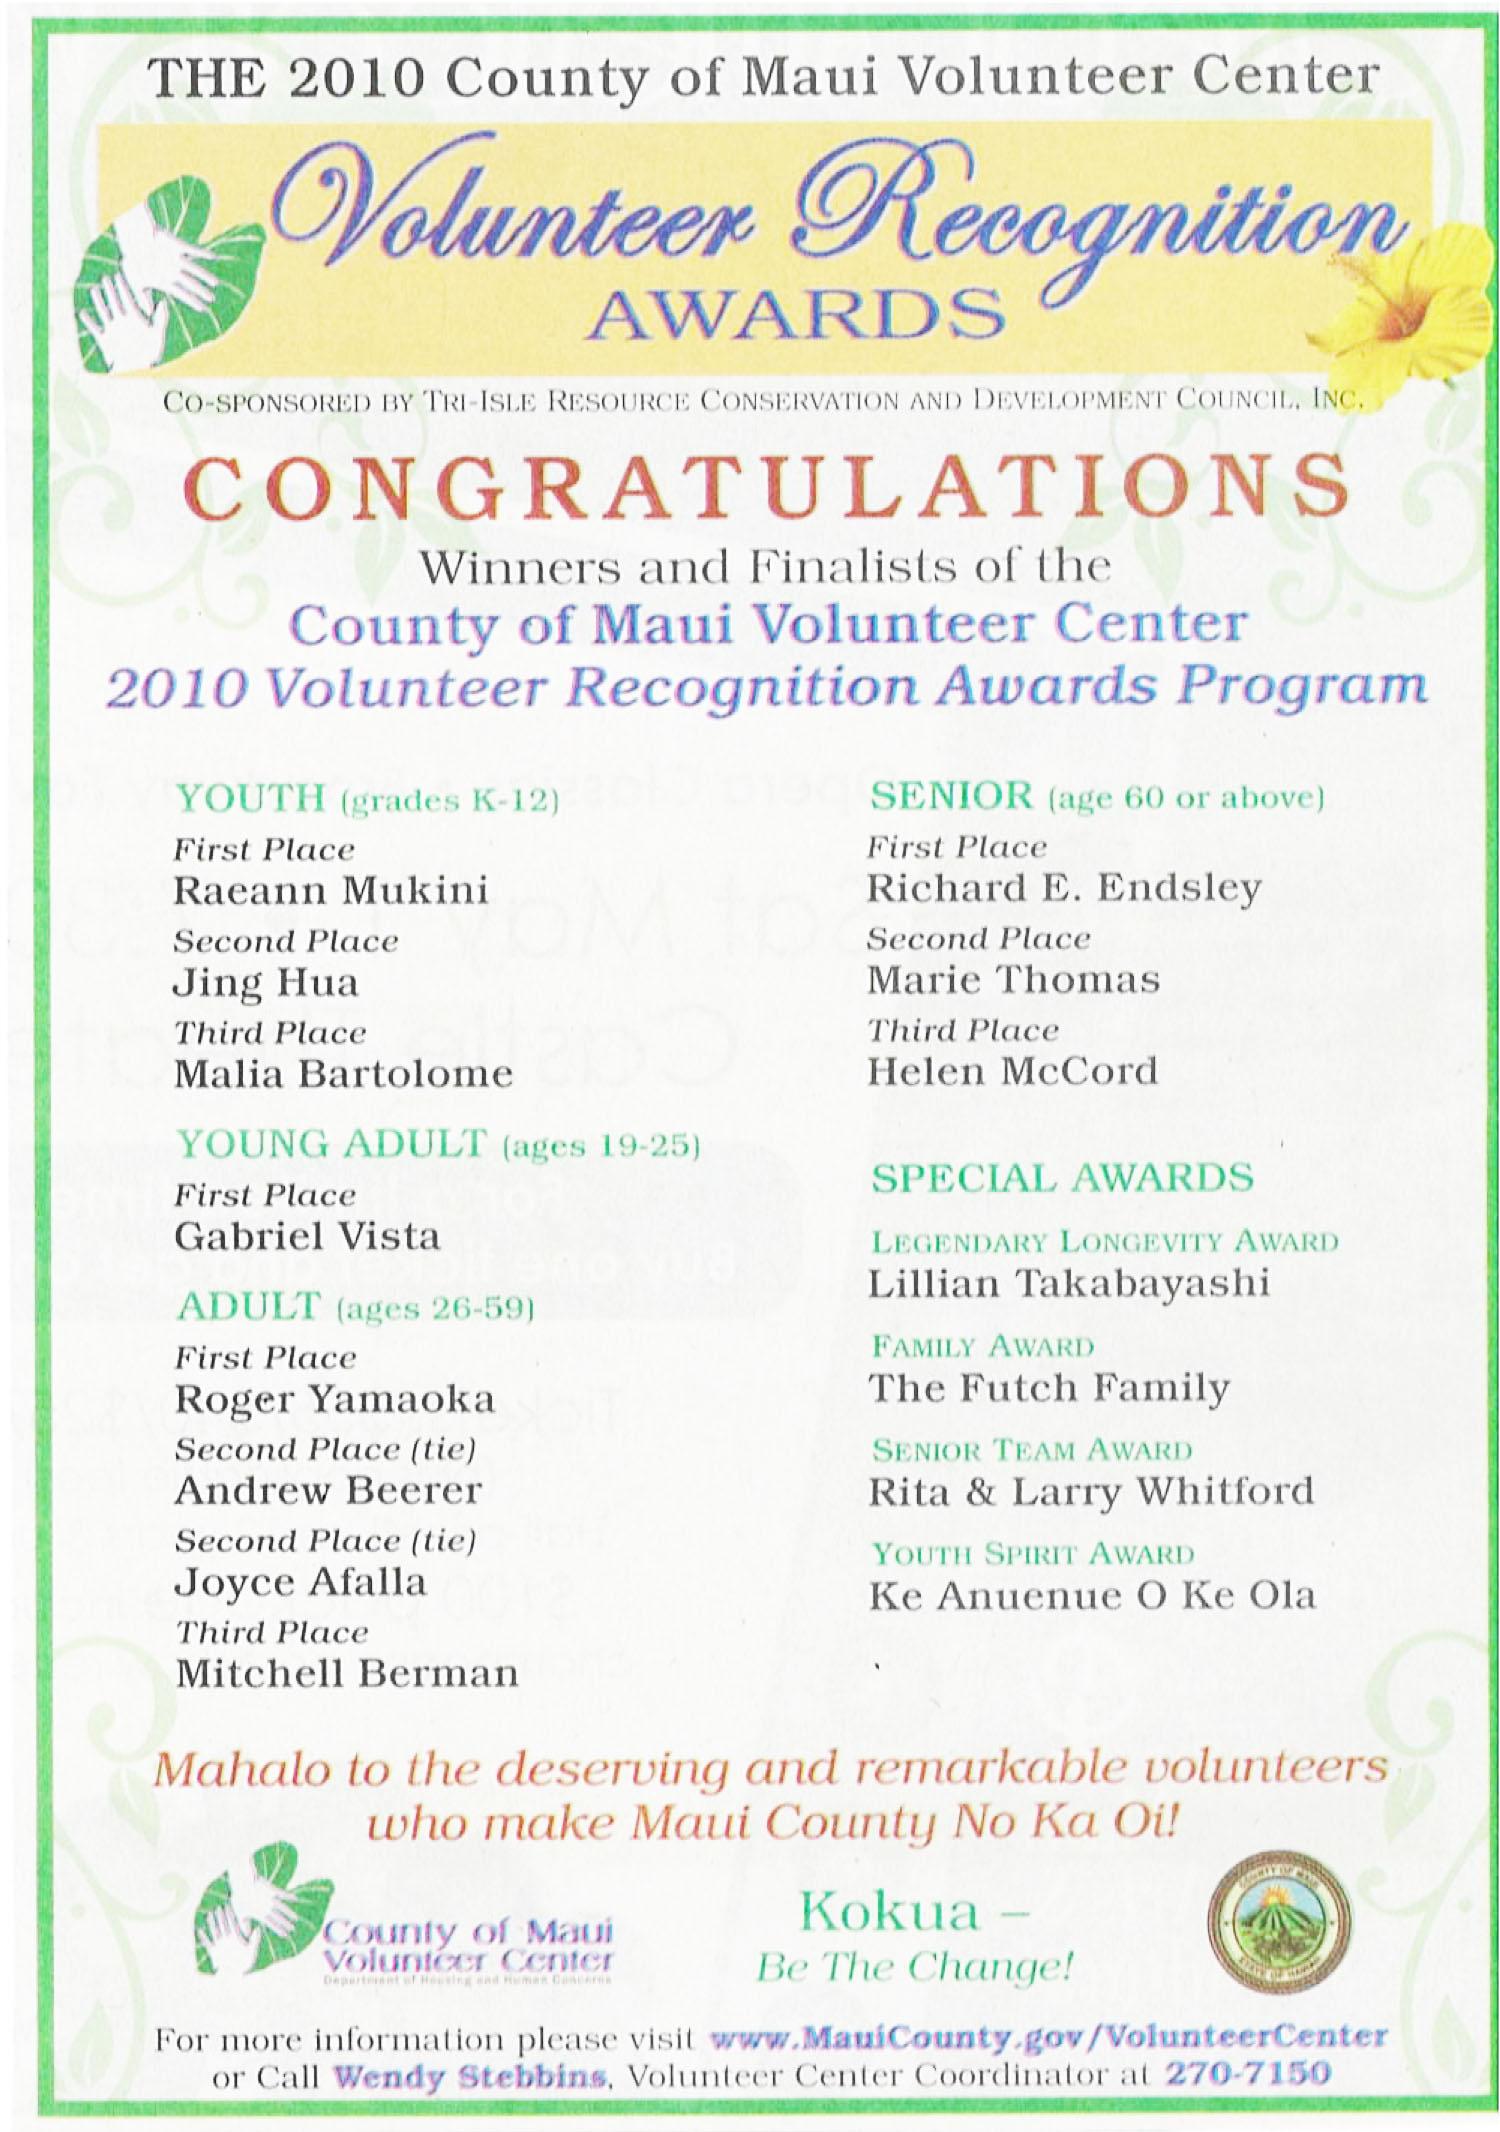 Kihei Volunteers Recognized